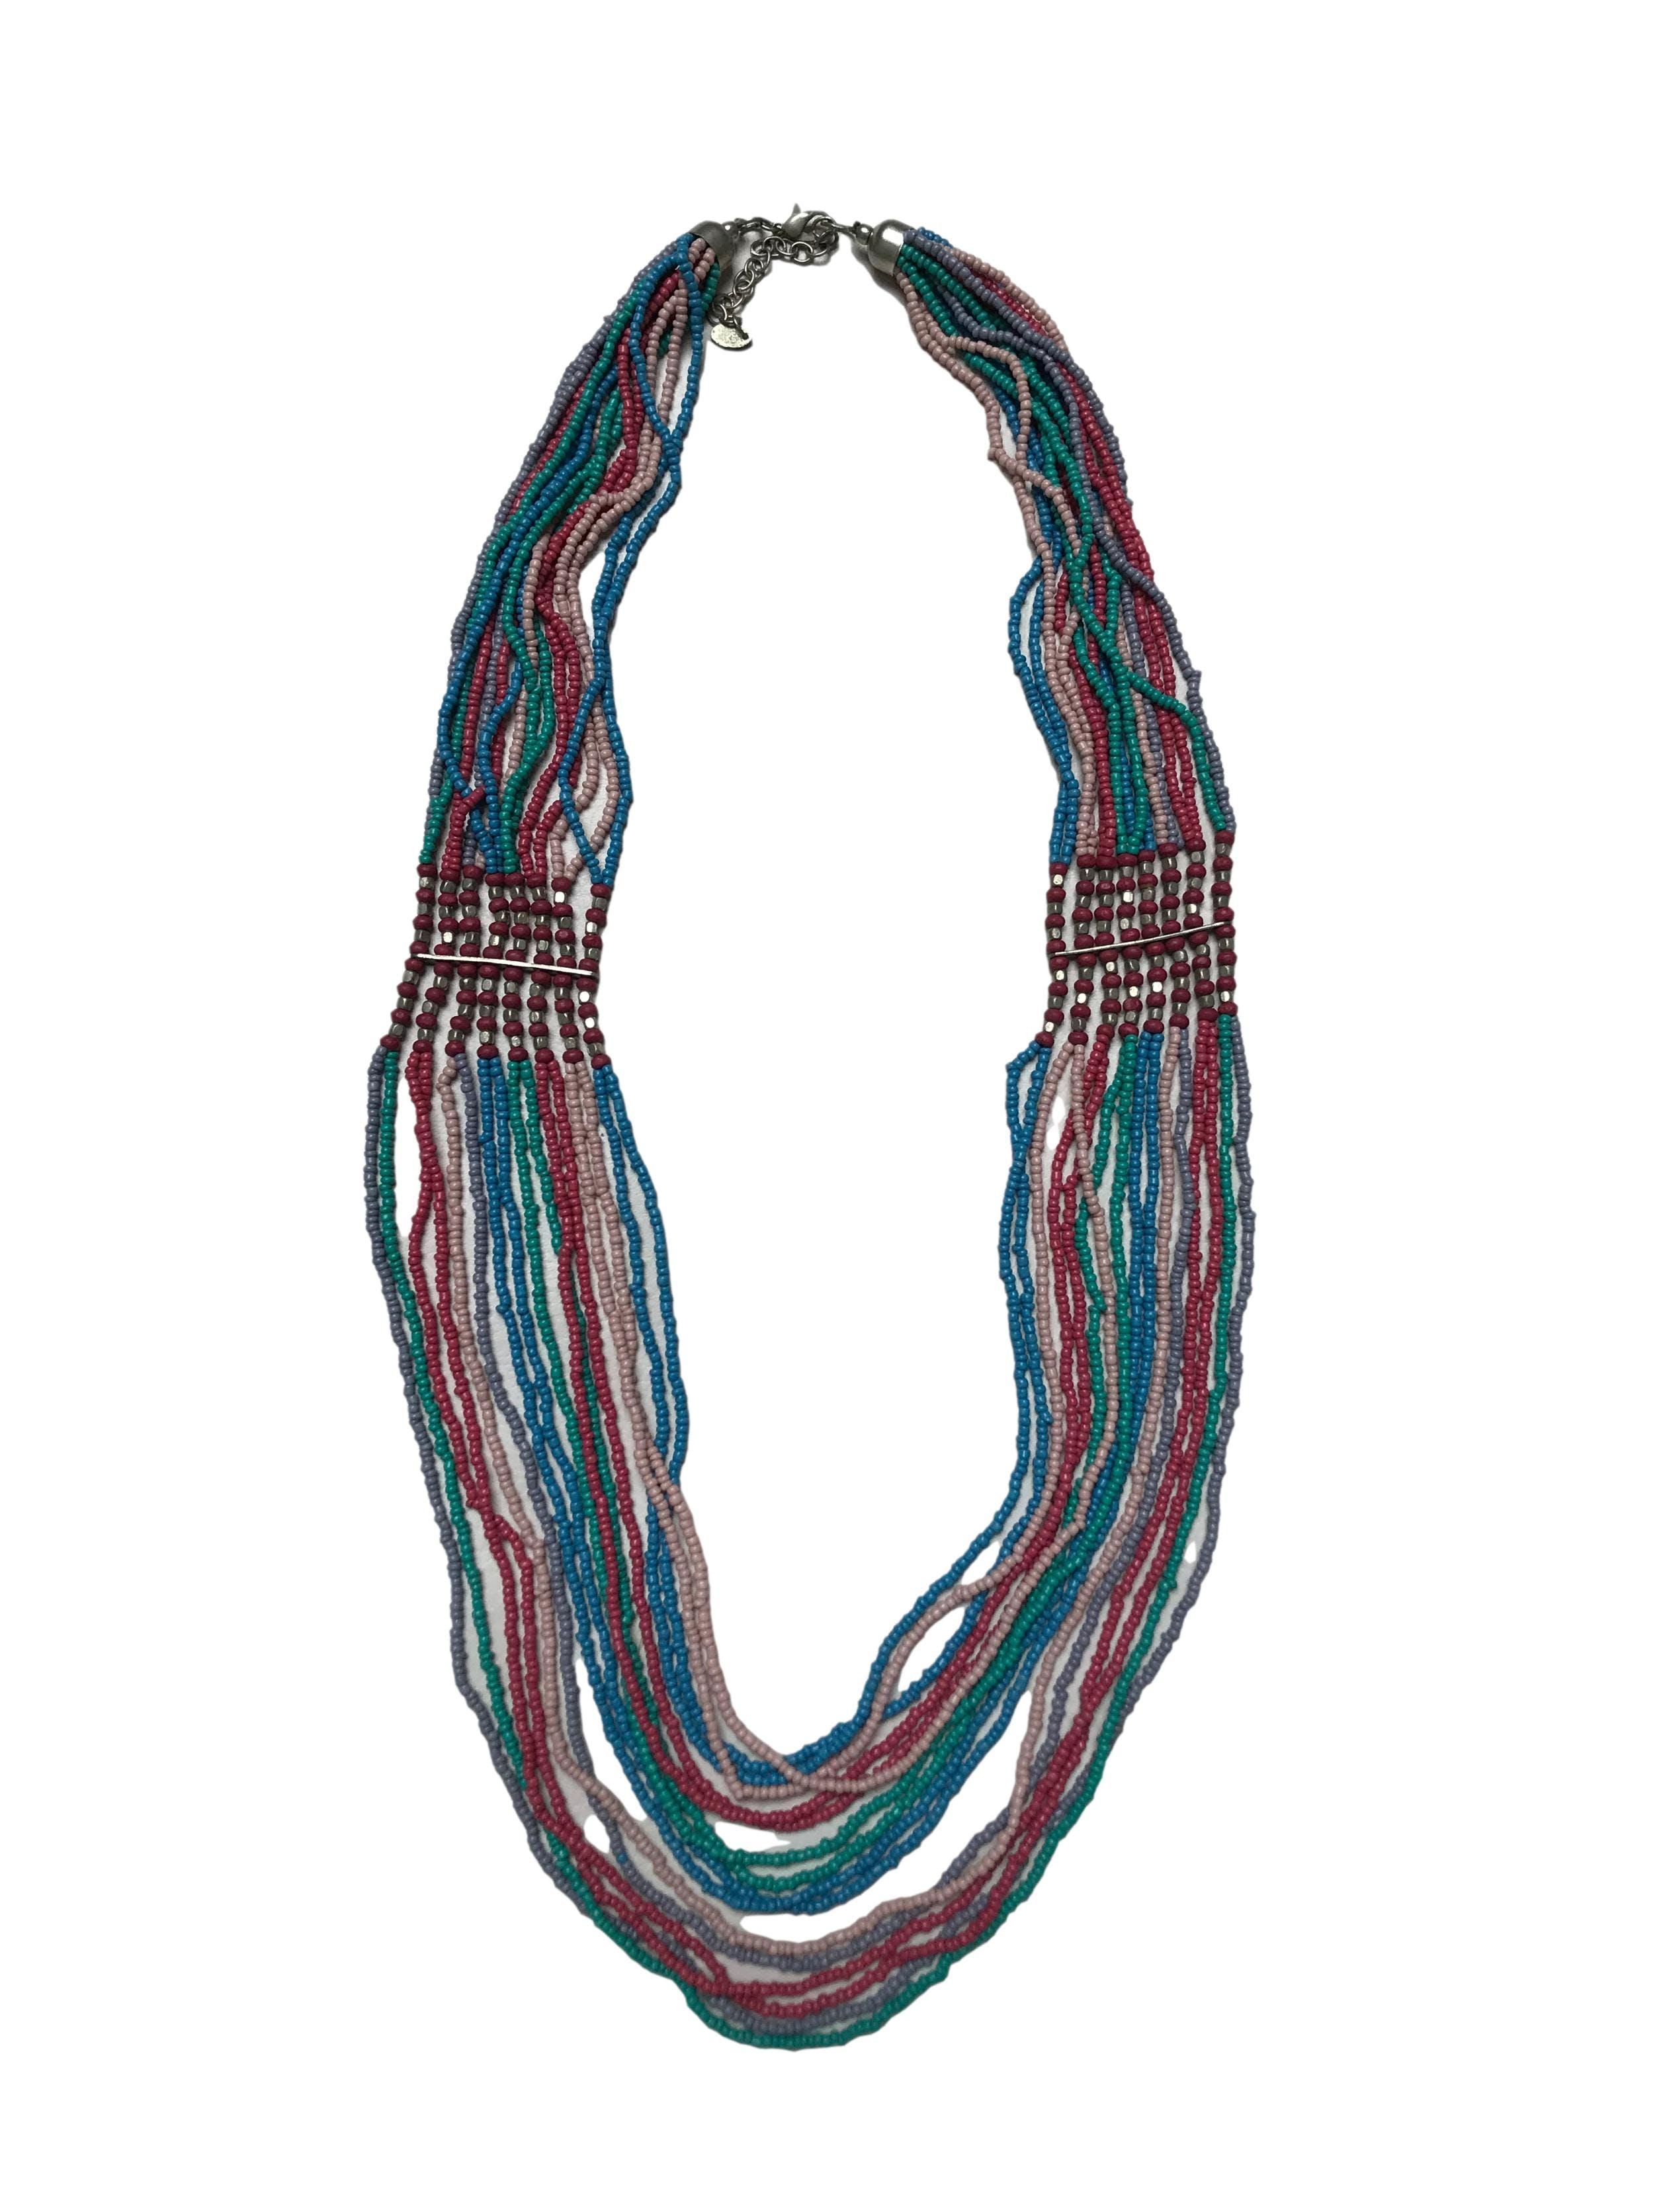 Collar Sfera de 16 tiras de mostacillas de colores. Largo 80 cm